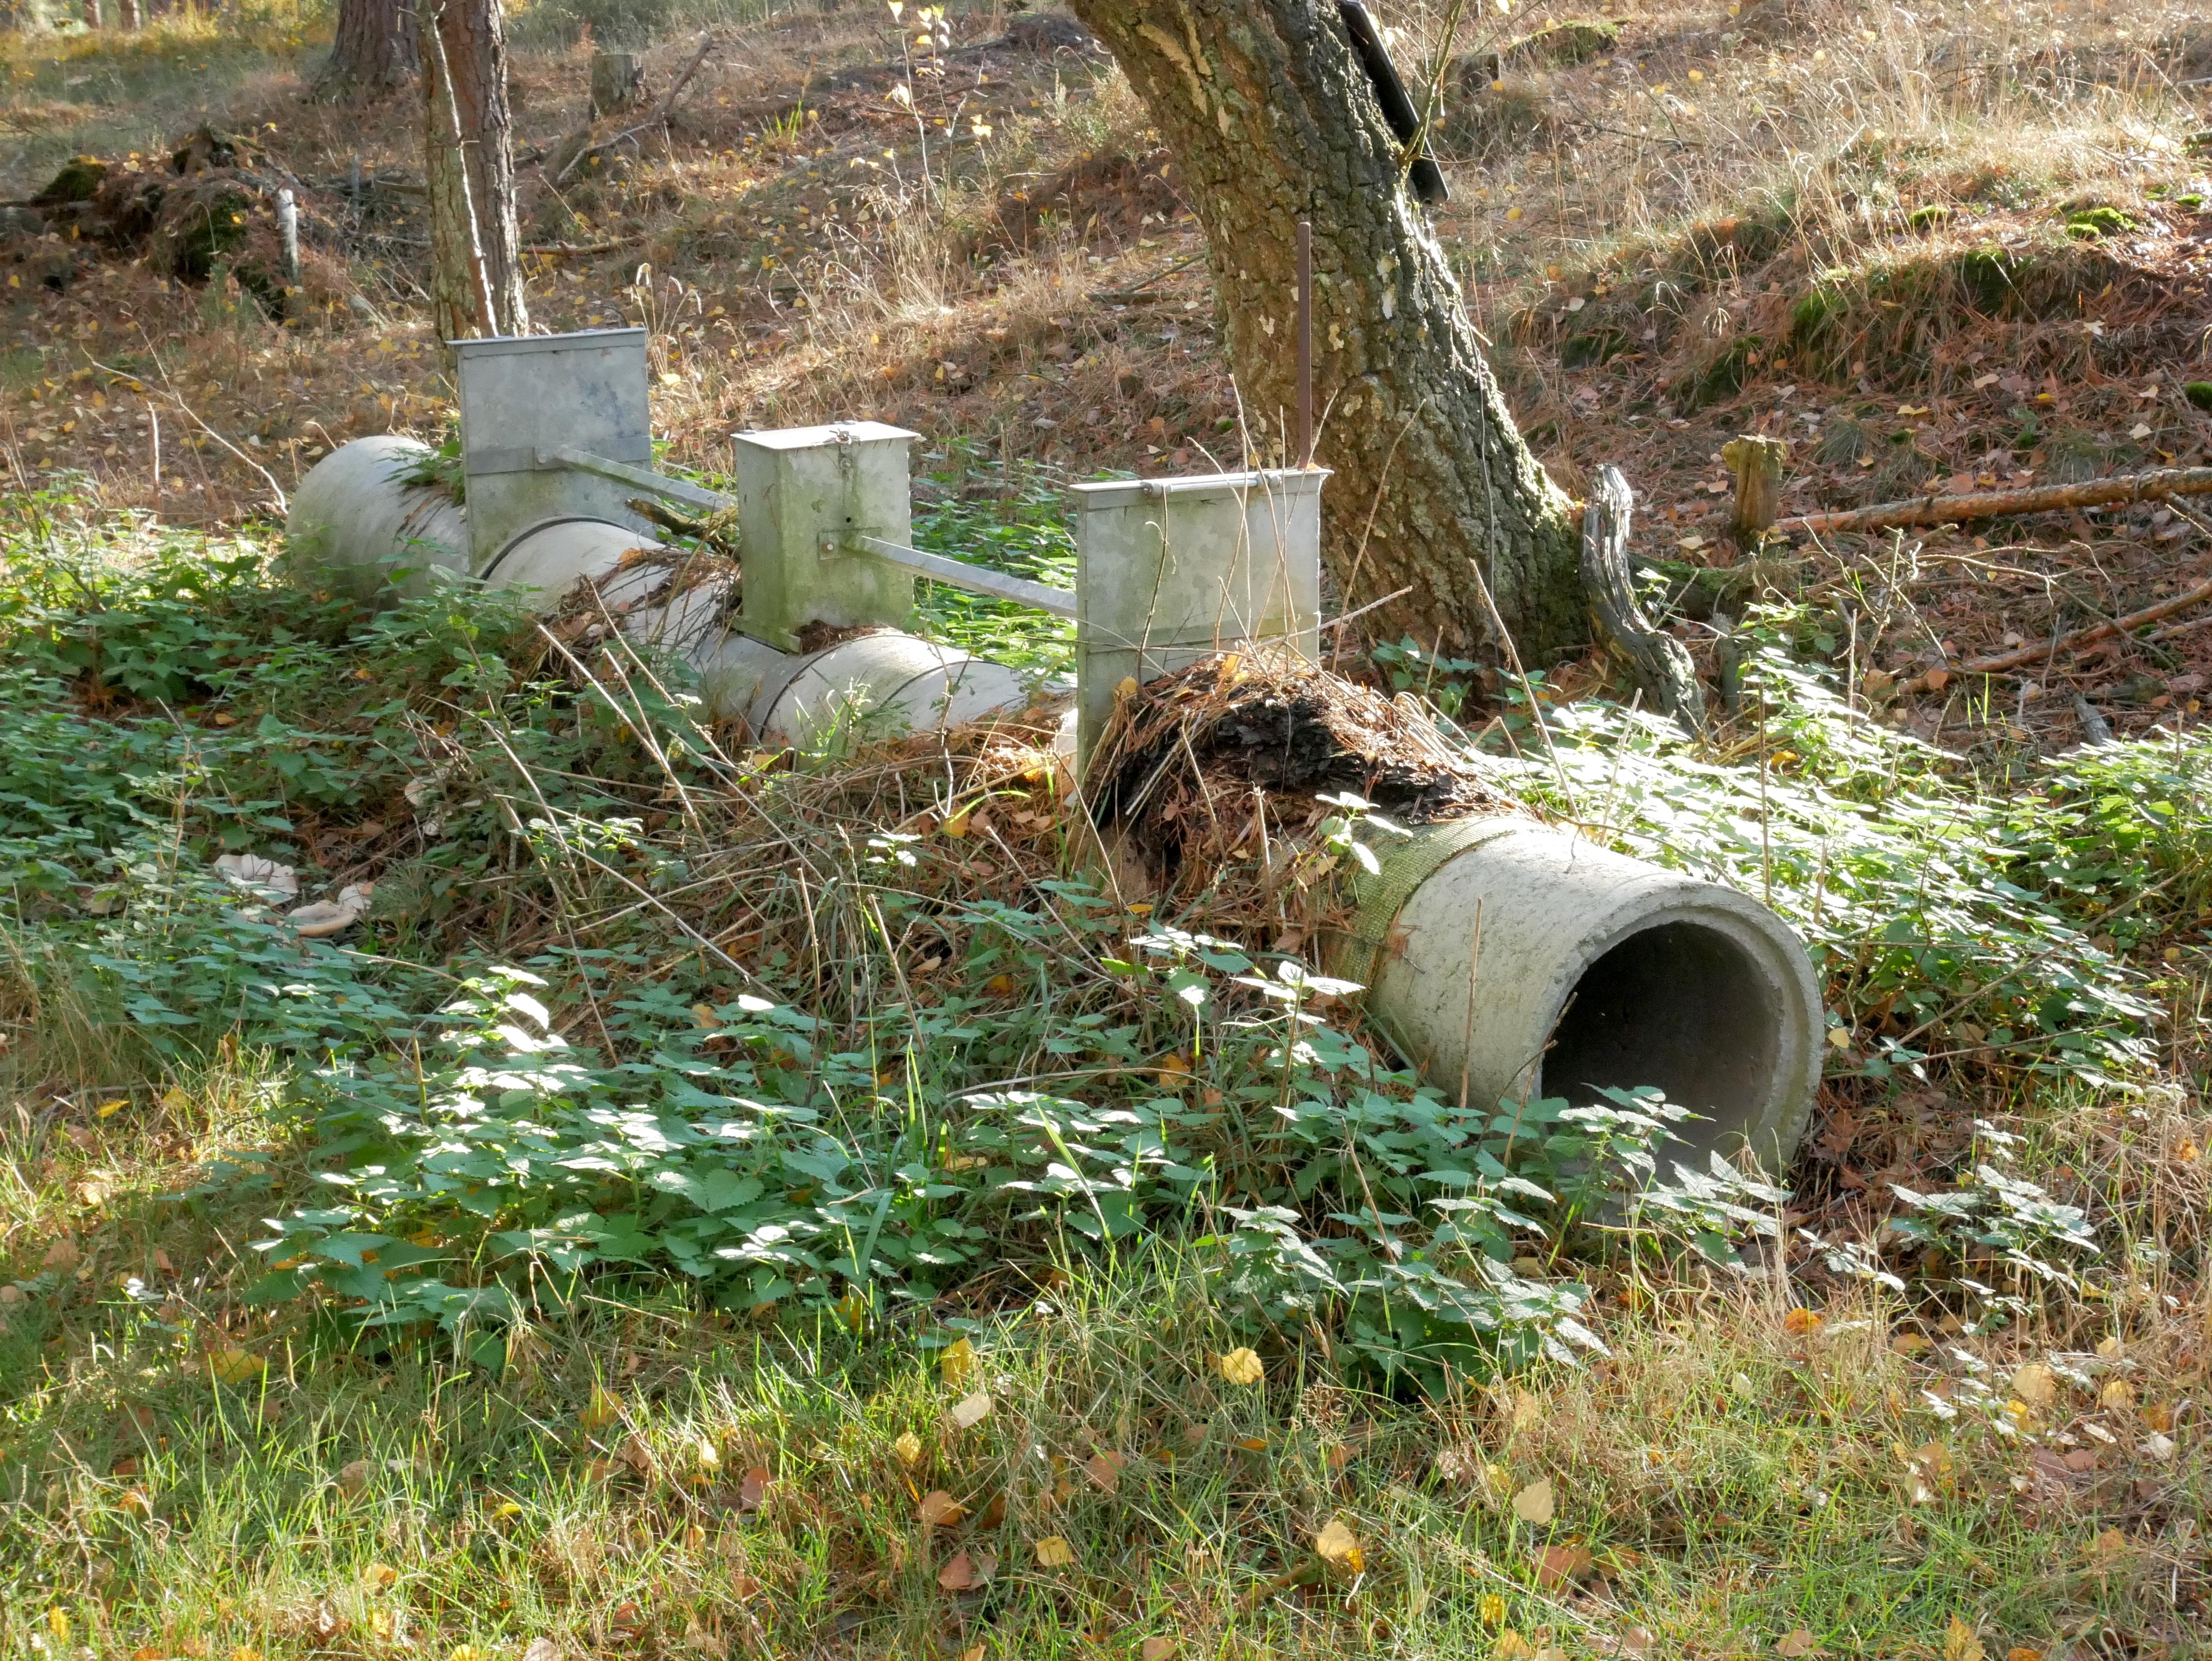 file:betonrohrfalle im wald - wikimedia commons